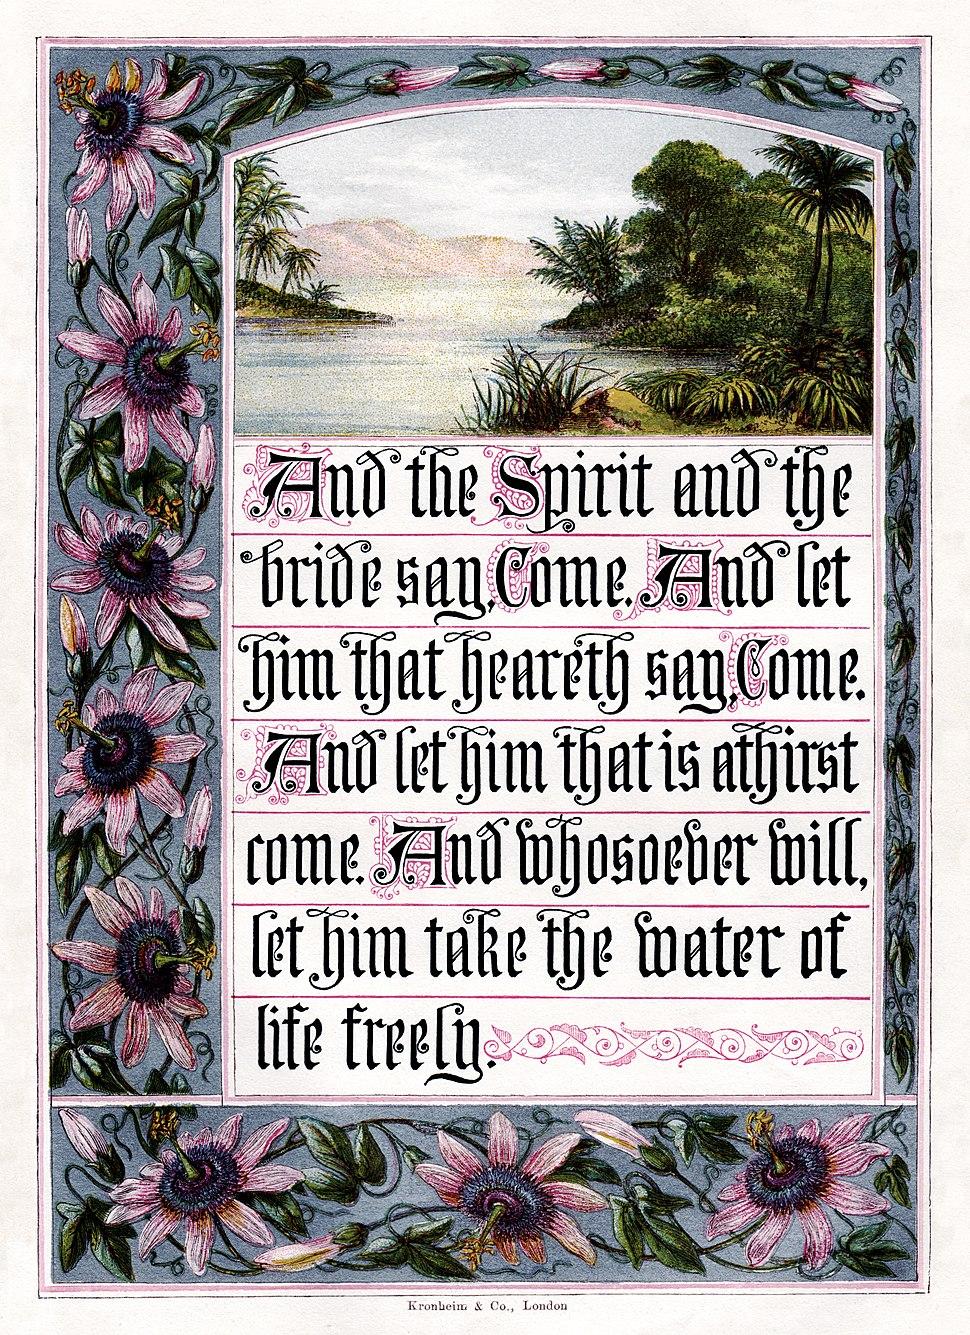 Joseph Martin Kronheim - The Sunday at Home 1880 - Revelation 22-17